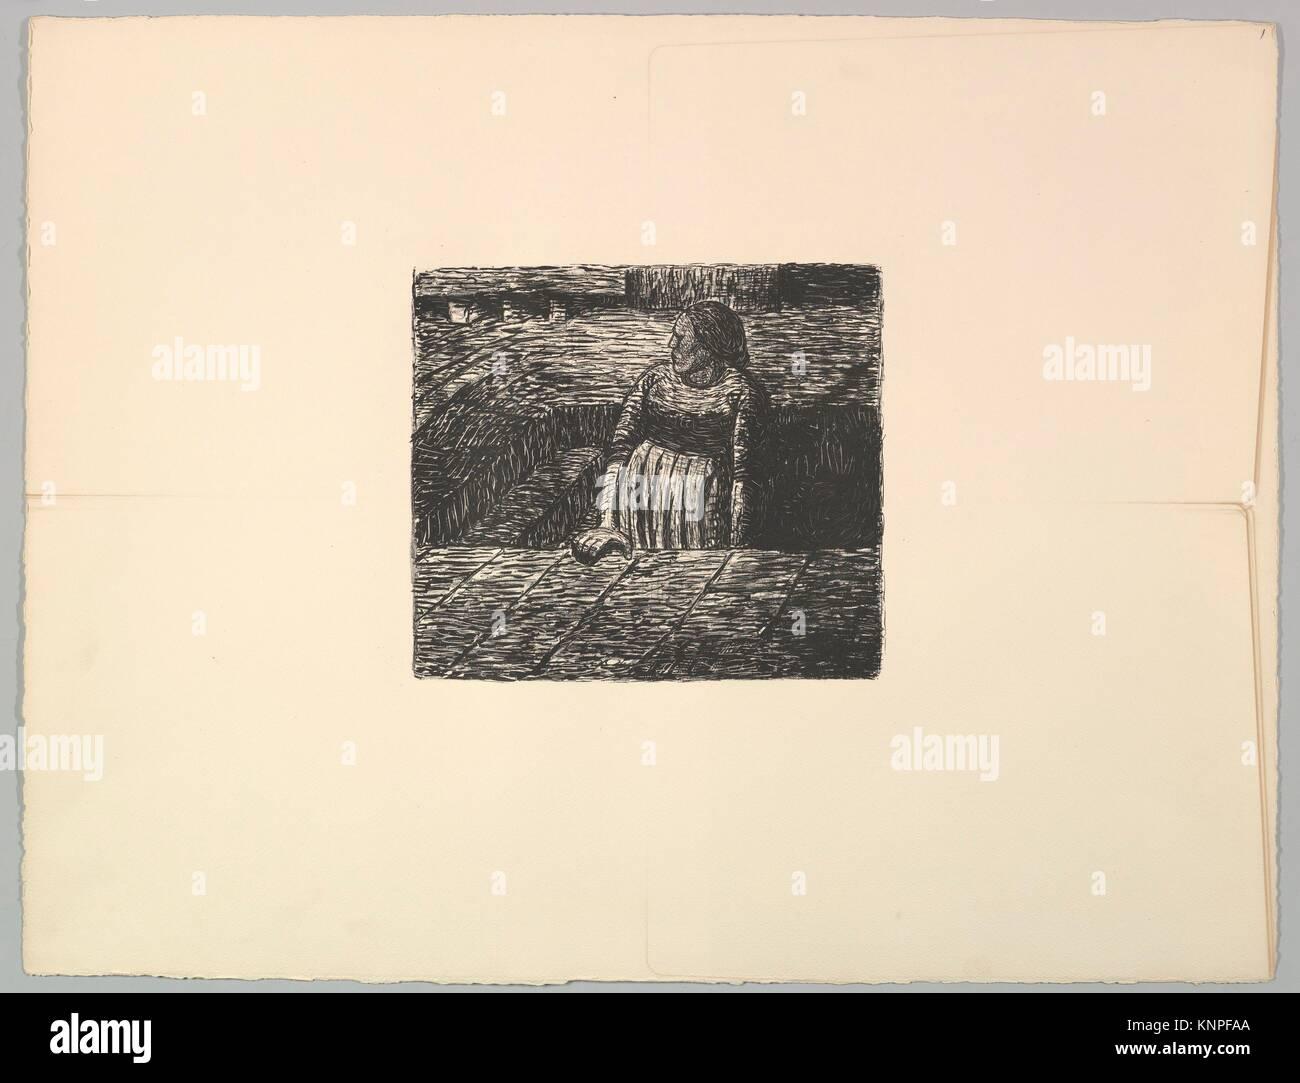 1912 Artist Stockfotos & 1912 Artist Bilder - Alamy